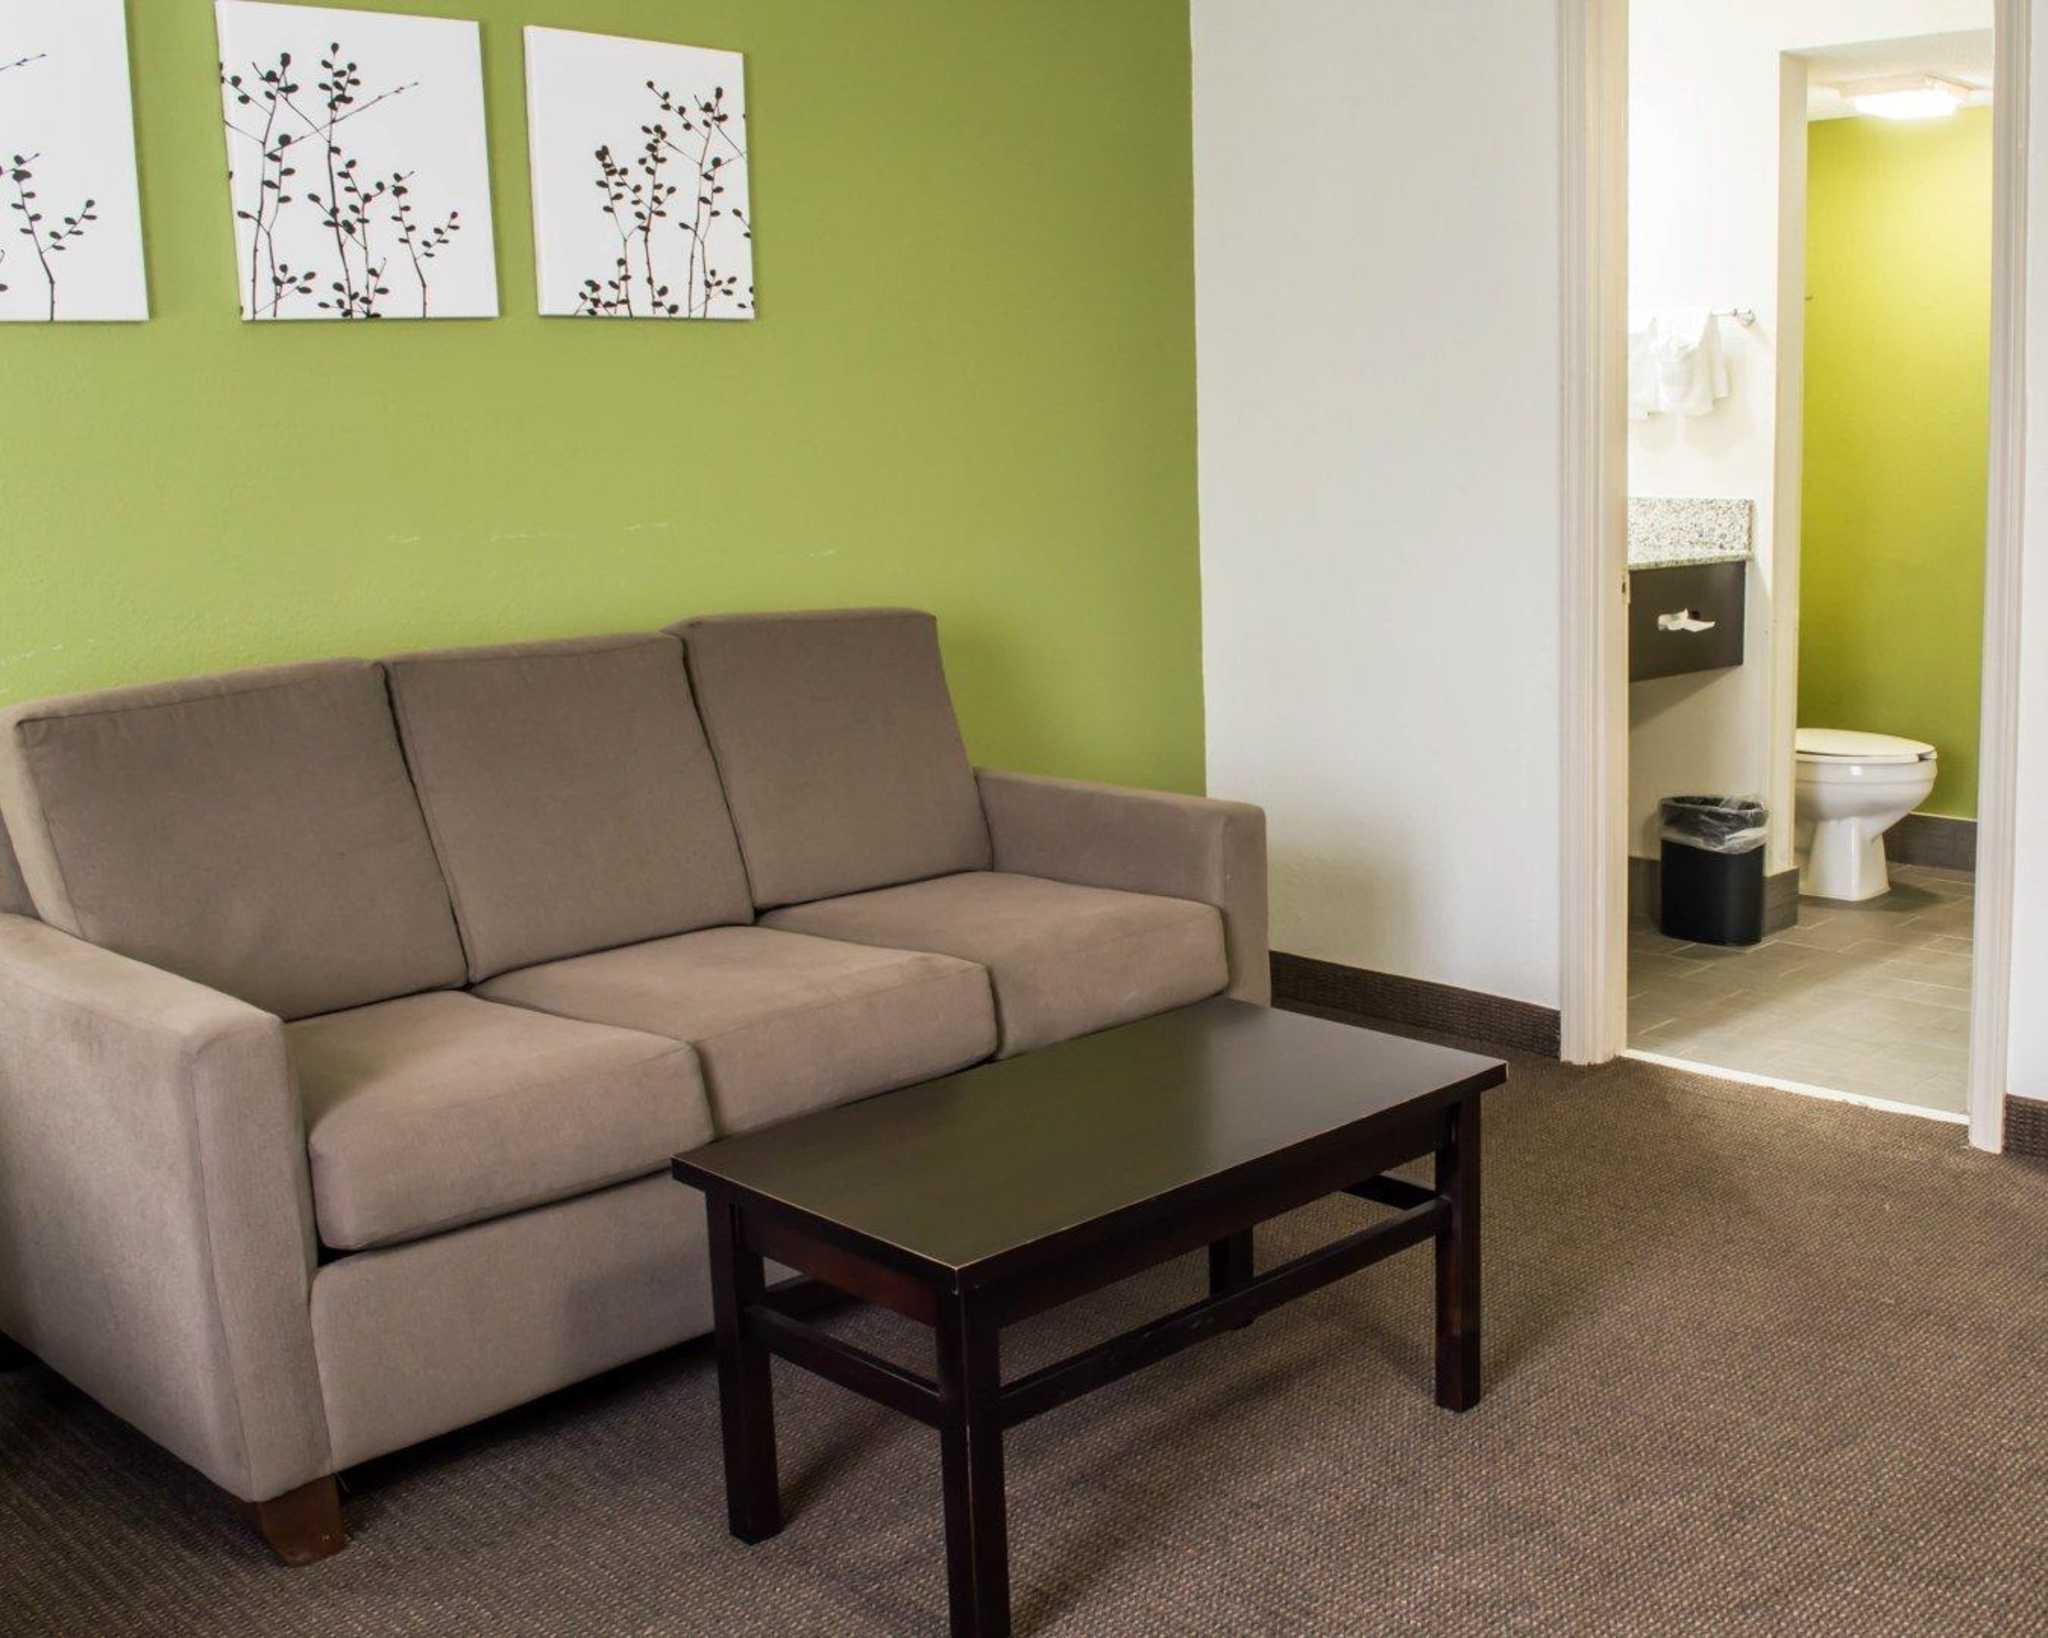 Sleep Inn & Suites near Halifax Regional Medical Center image 22